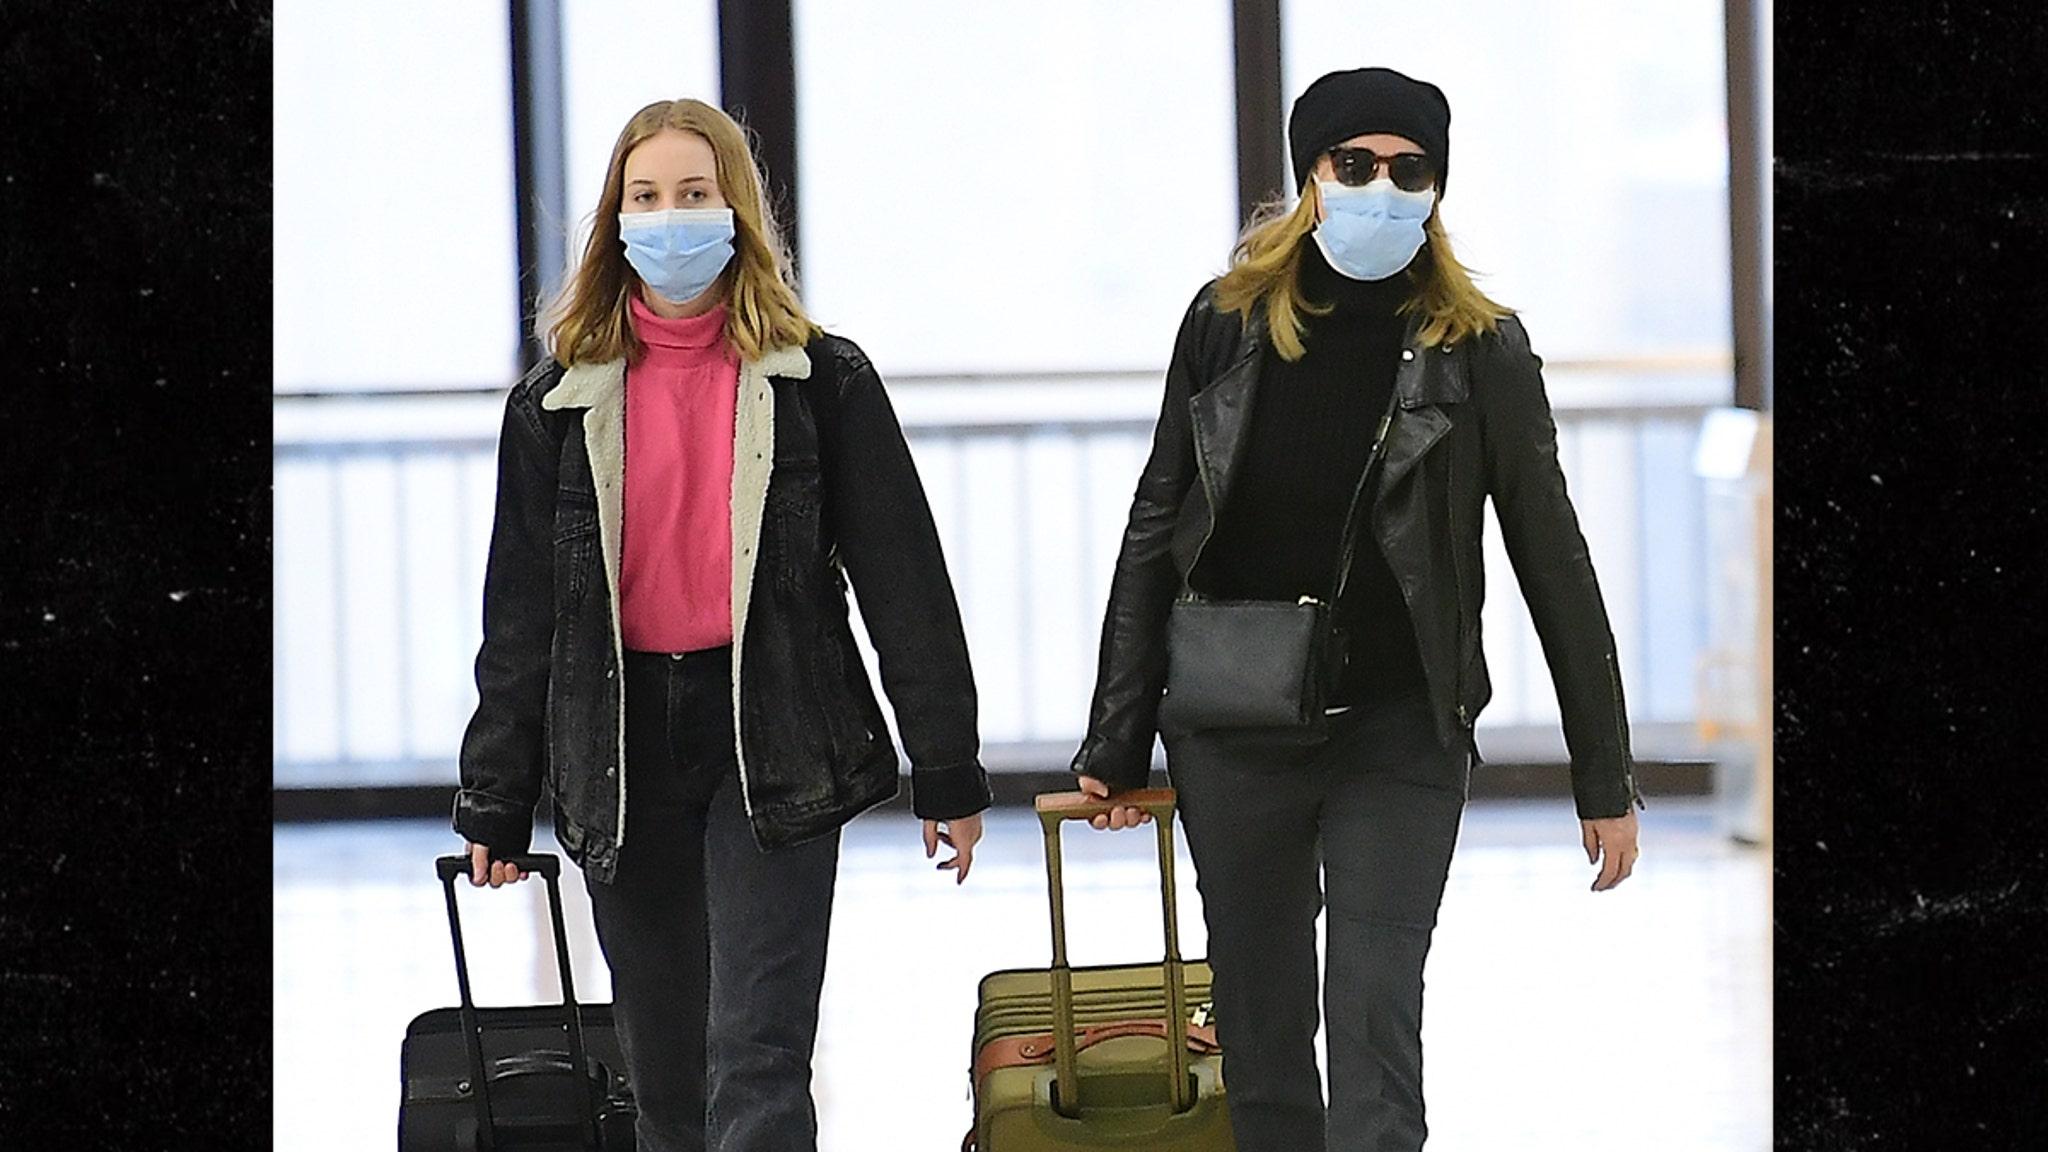 Felicity Huffman & Daughter Wear Masks at Airport Amid Coronavirus Scare